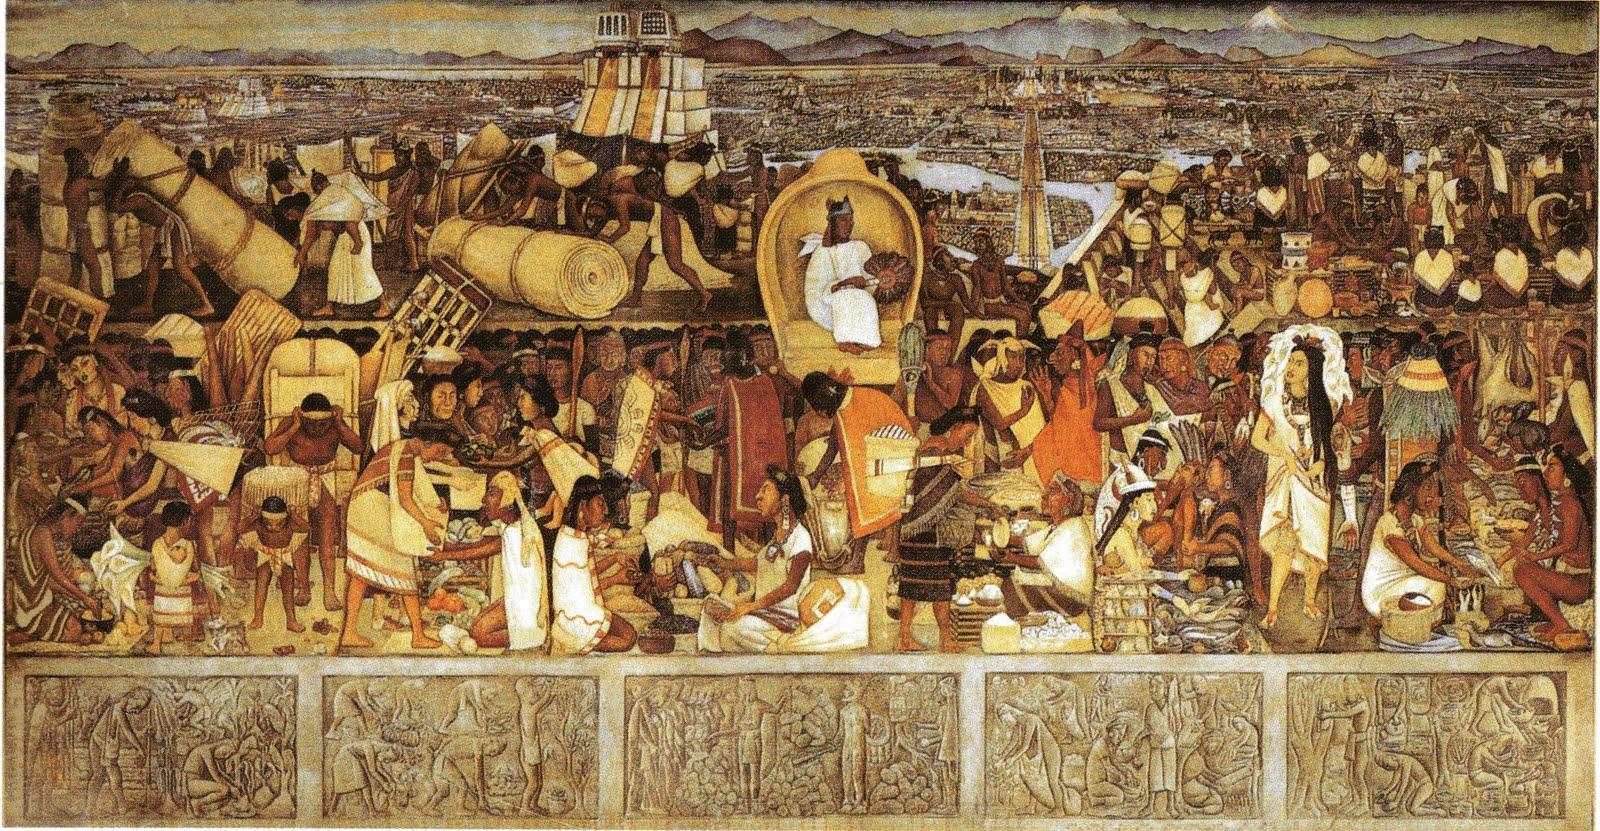 Punt volat un poema d 39 ngel pla for Diego rivera tenochtitlan mural